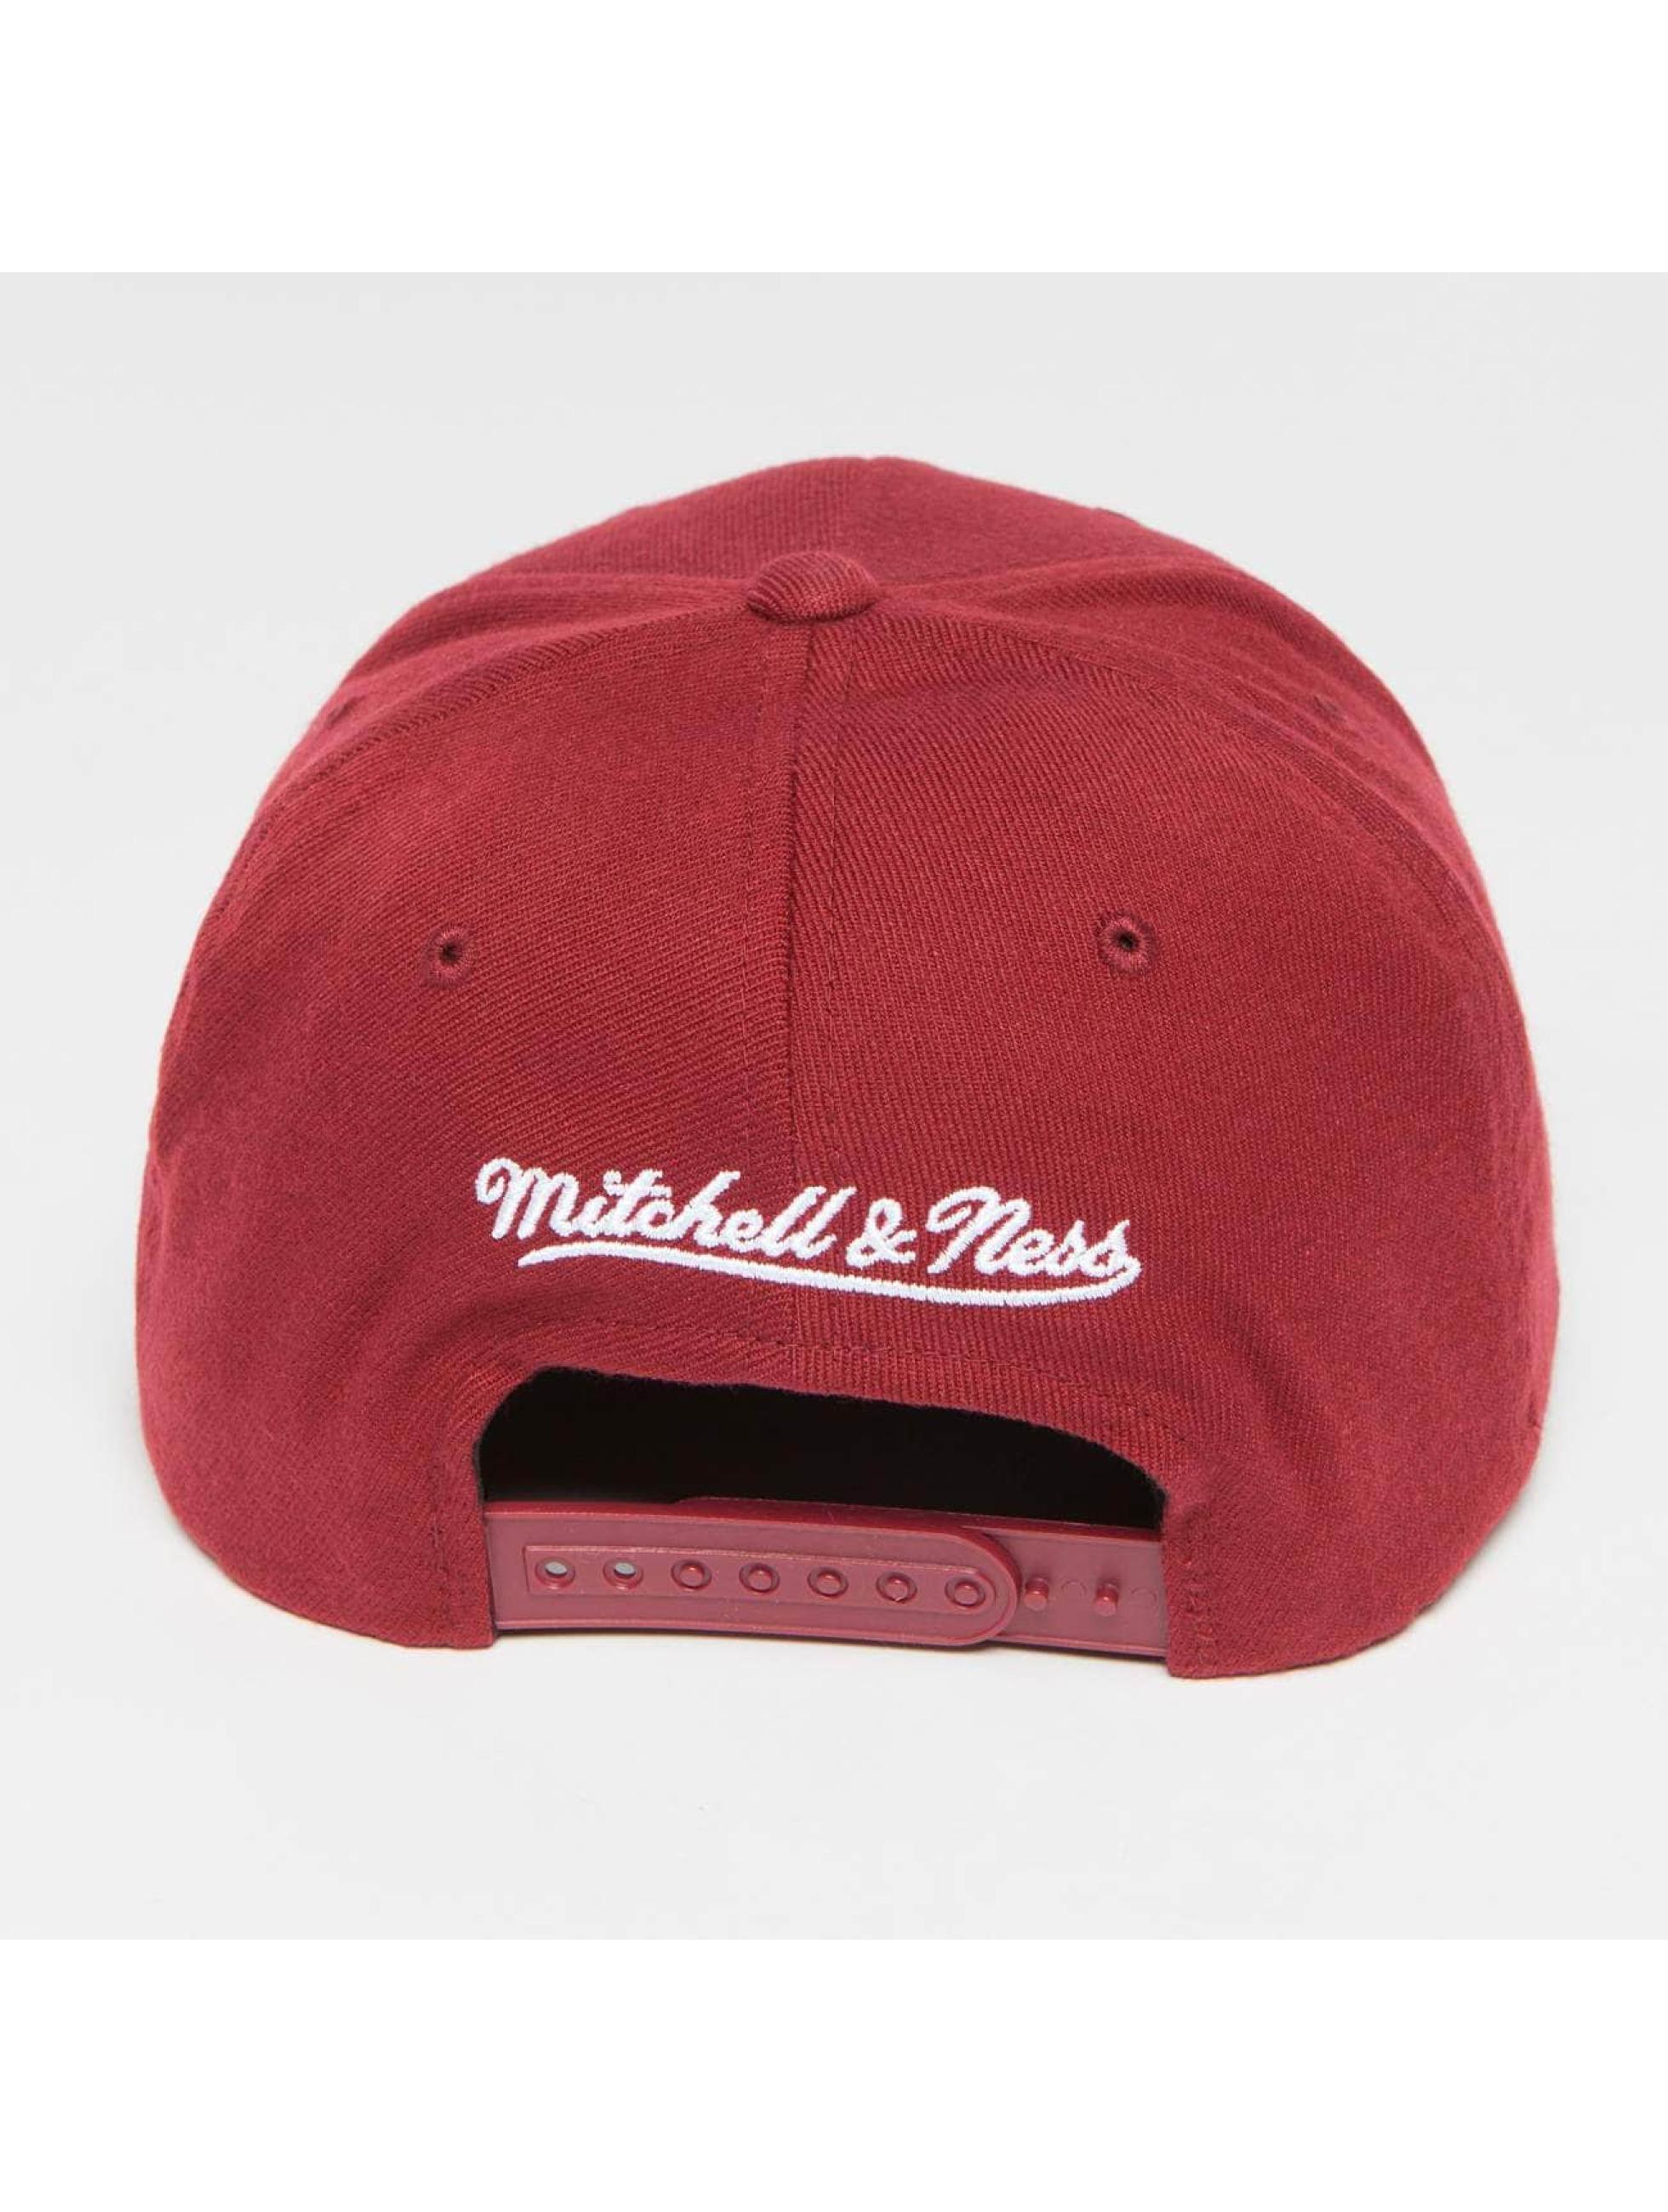 Mitchell & Ness Snapback Caps The Burgundy 2-Tone Pinscript 110 punainen